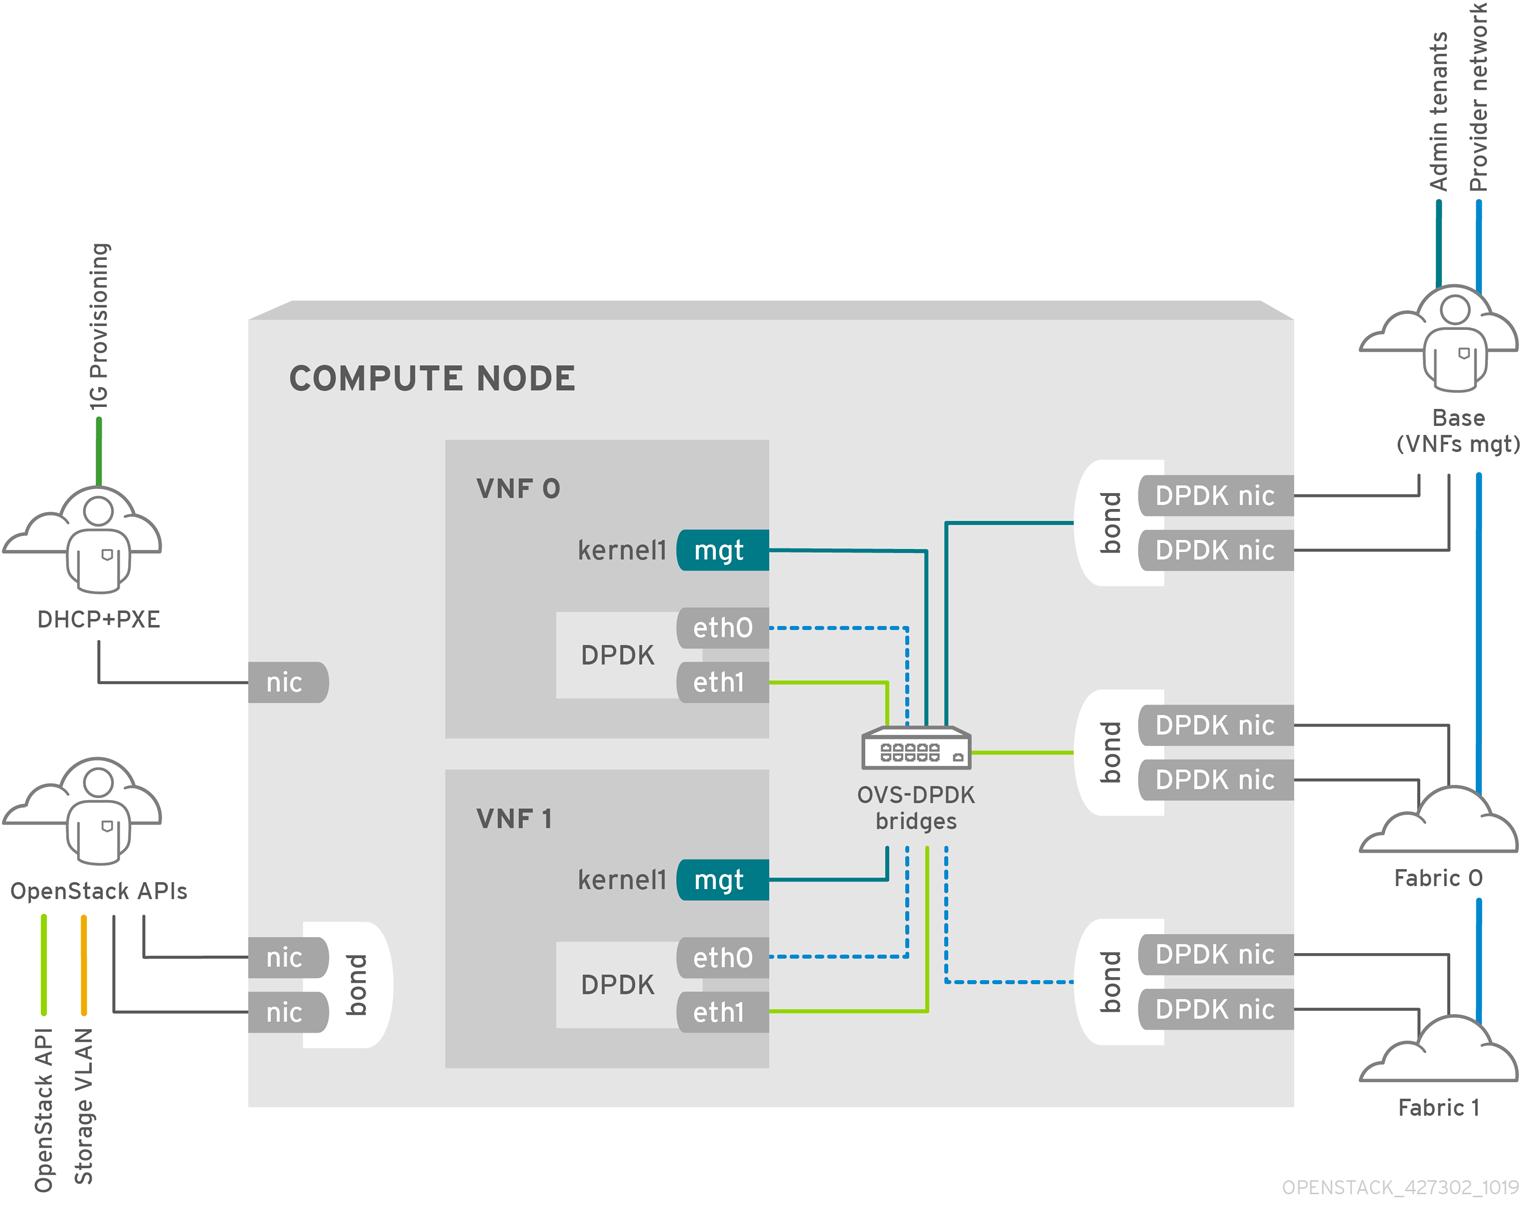 NFV OVS-DPDK deployment